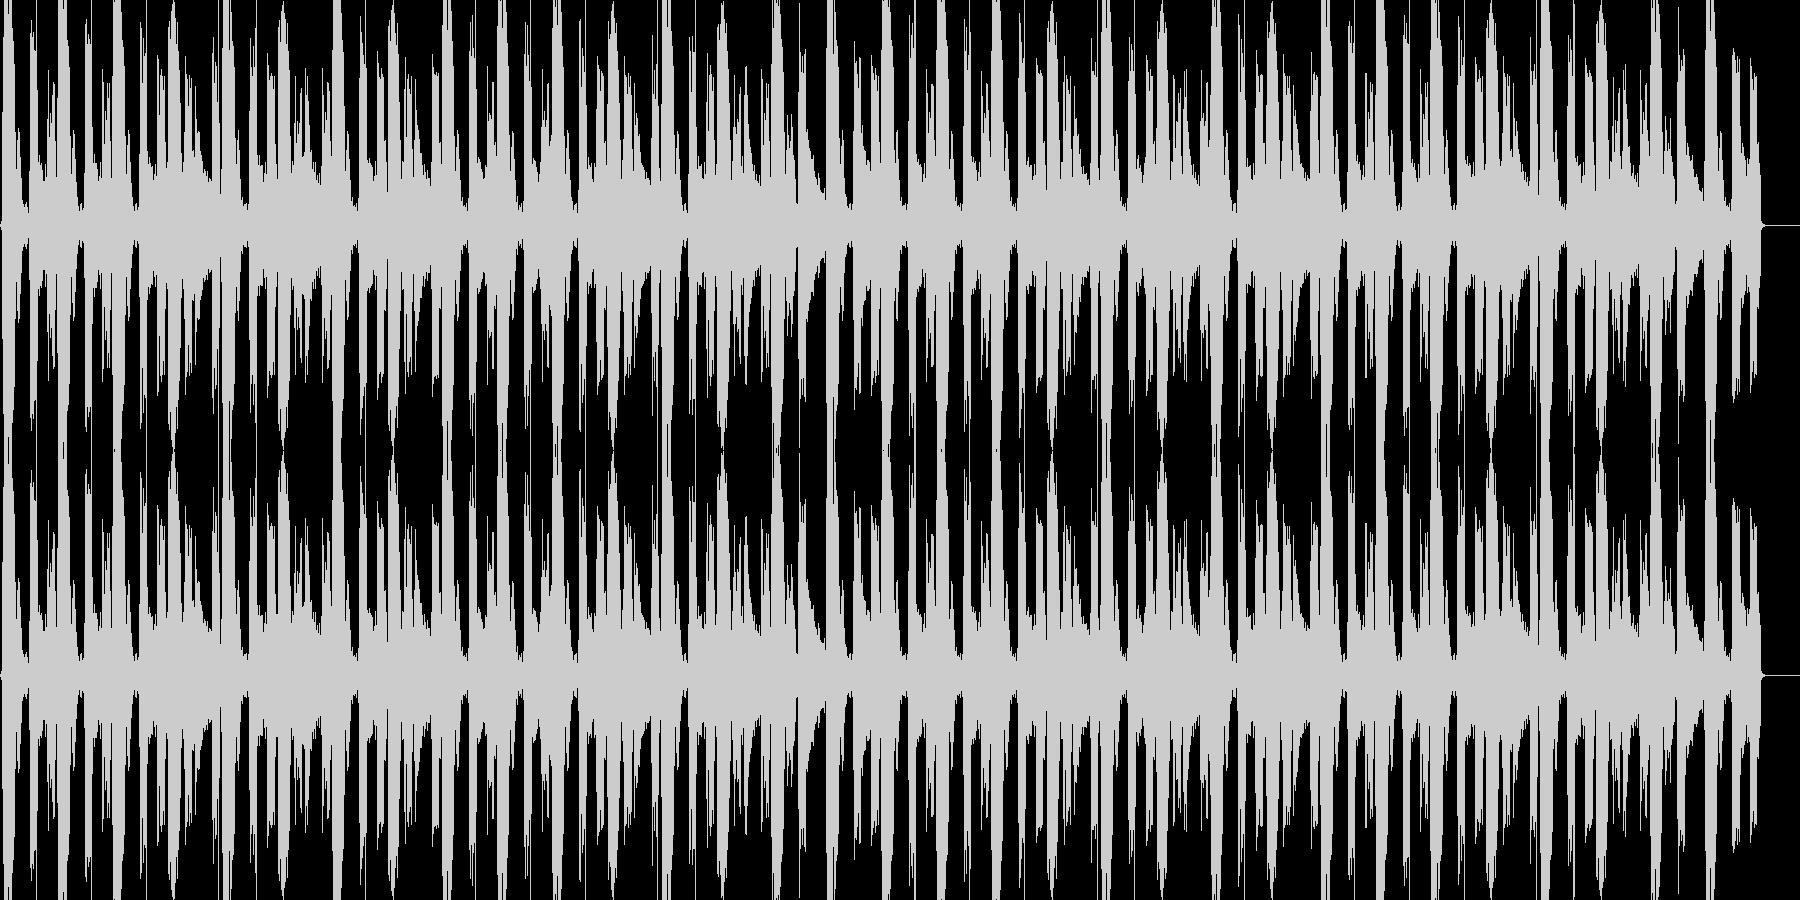 LOOP用ドラムの未再生の波形